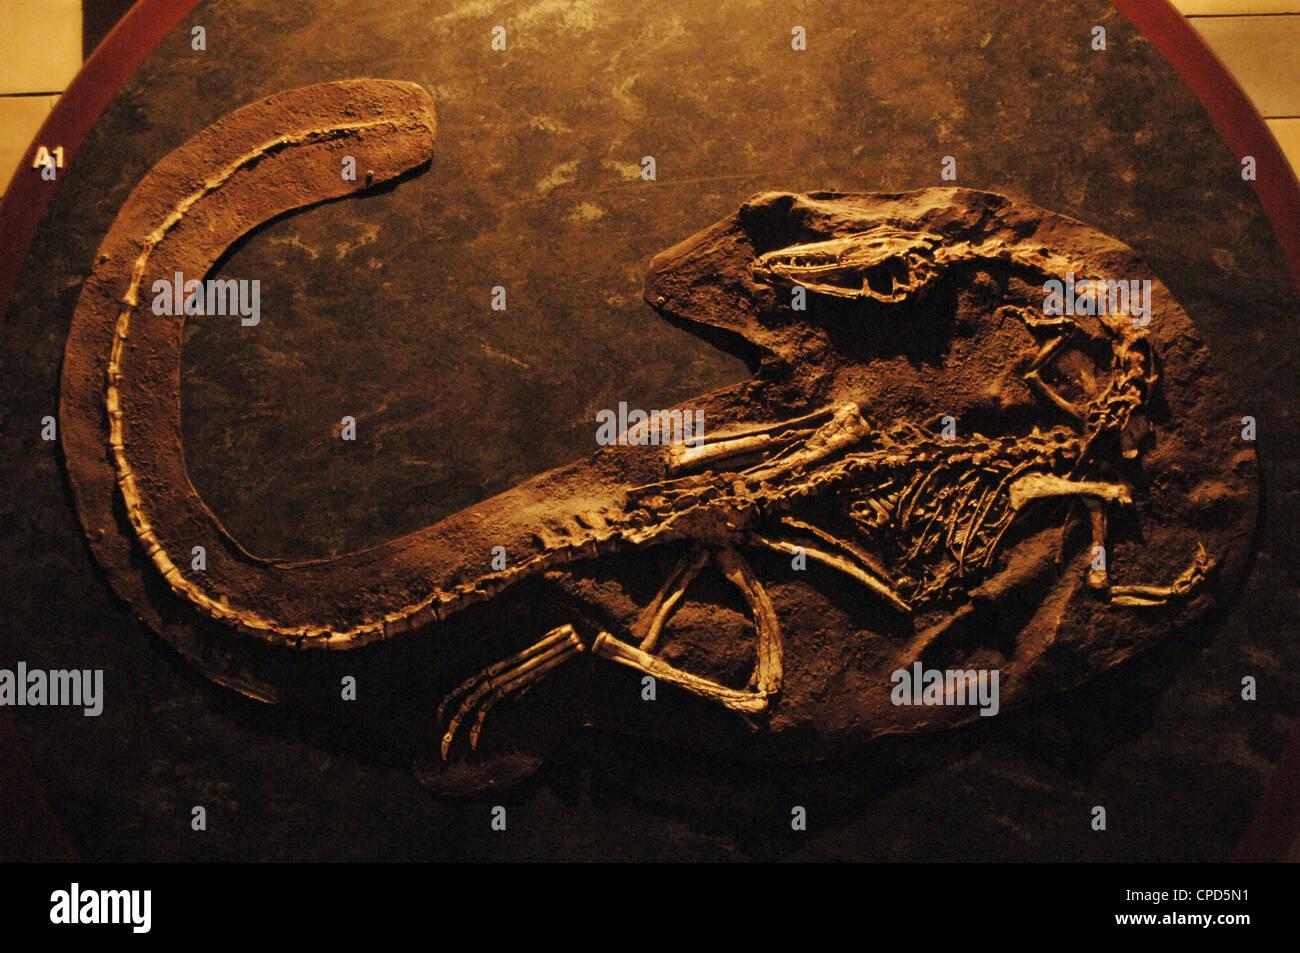 Coelophysis skeleton. 210 million years. Late Triassic. Natural History Museum. London. United Kingdom. - Stock Image